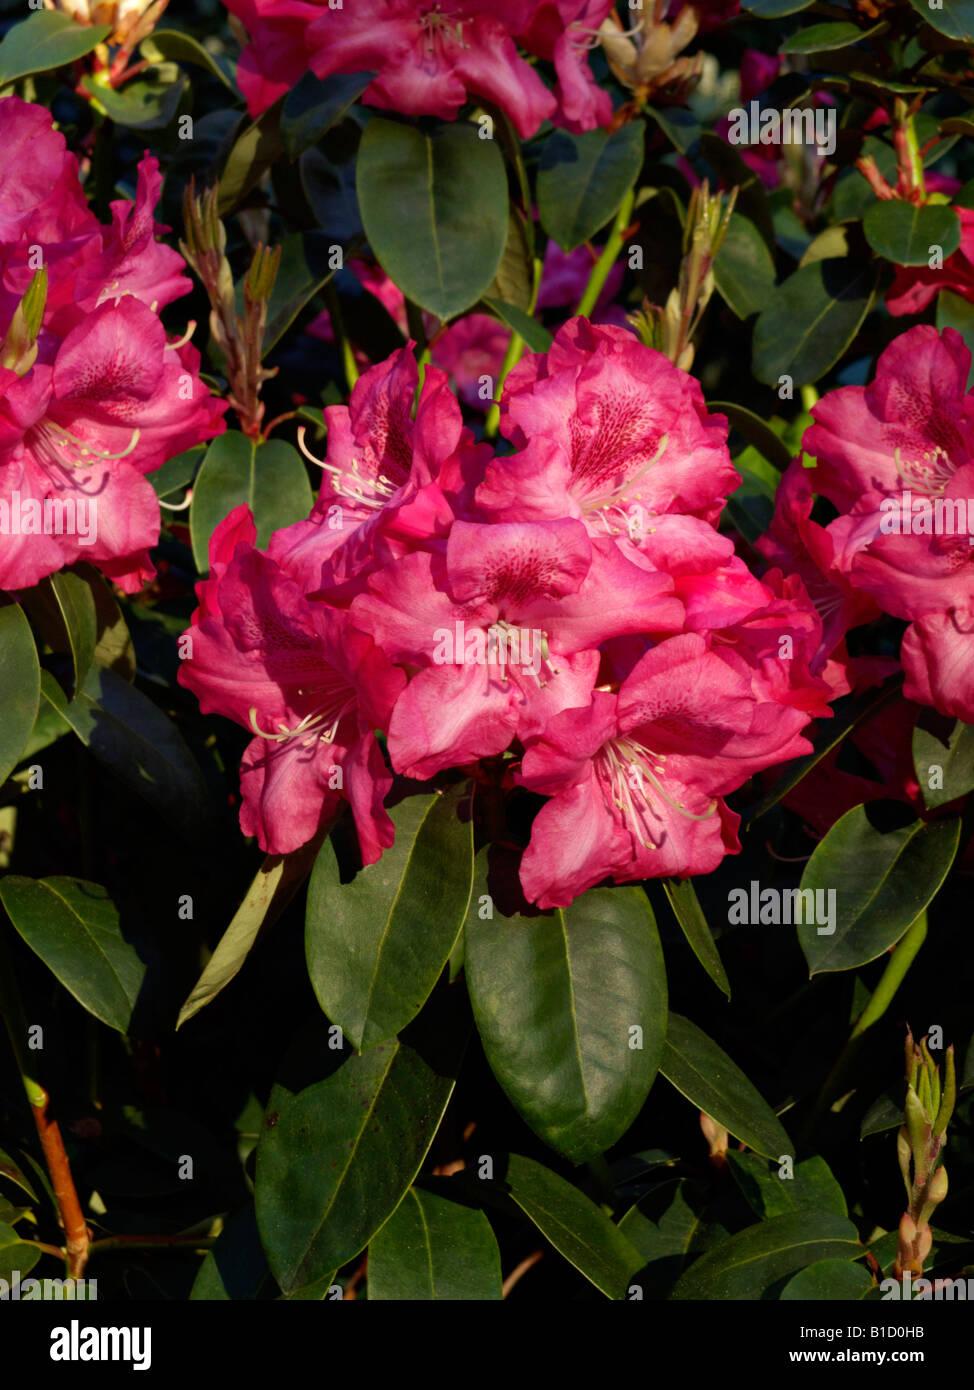 William's rhododendron (Rhododendron williamsianum 'Lissabon') Stock Photo